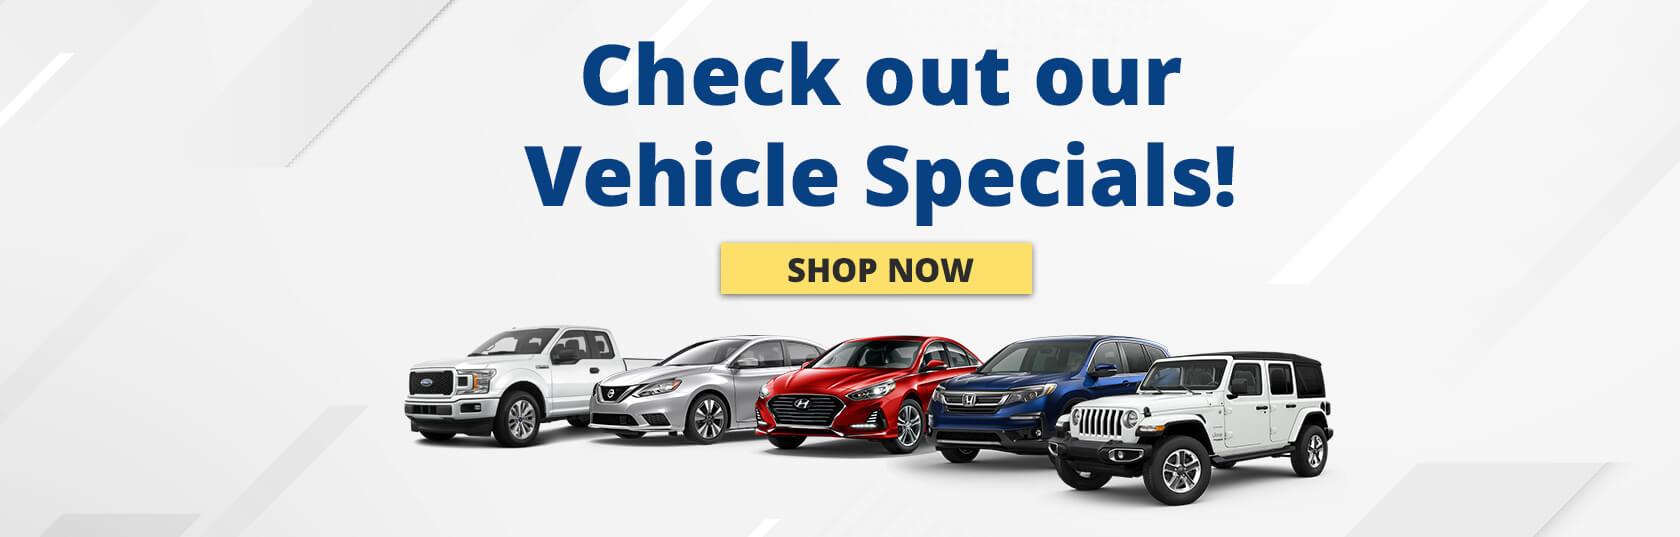 Used Cars Johnson City Tn >> Used Car Dealer Used Car Dealerships Serving Virginia Bristol